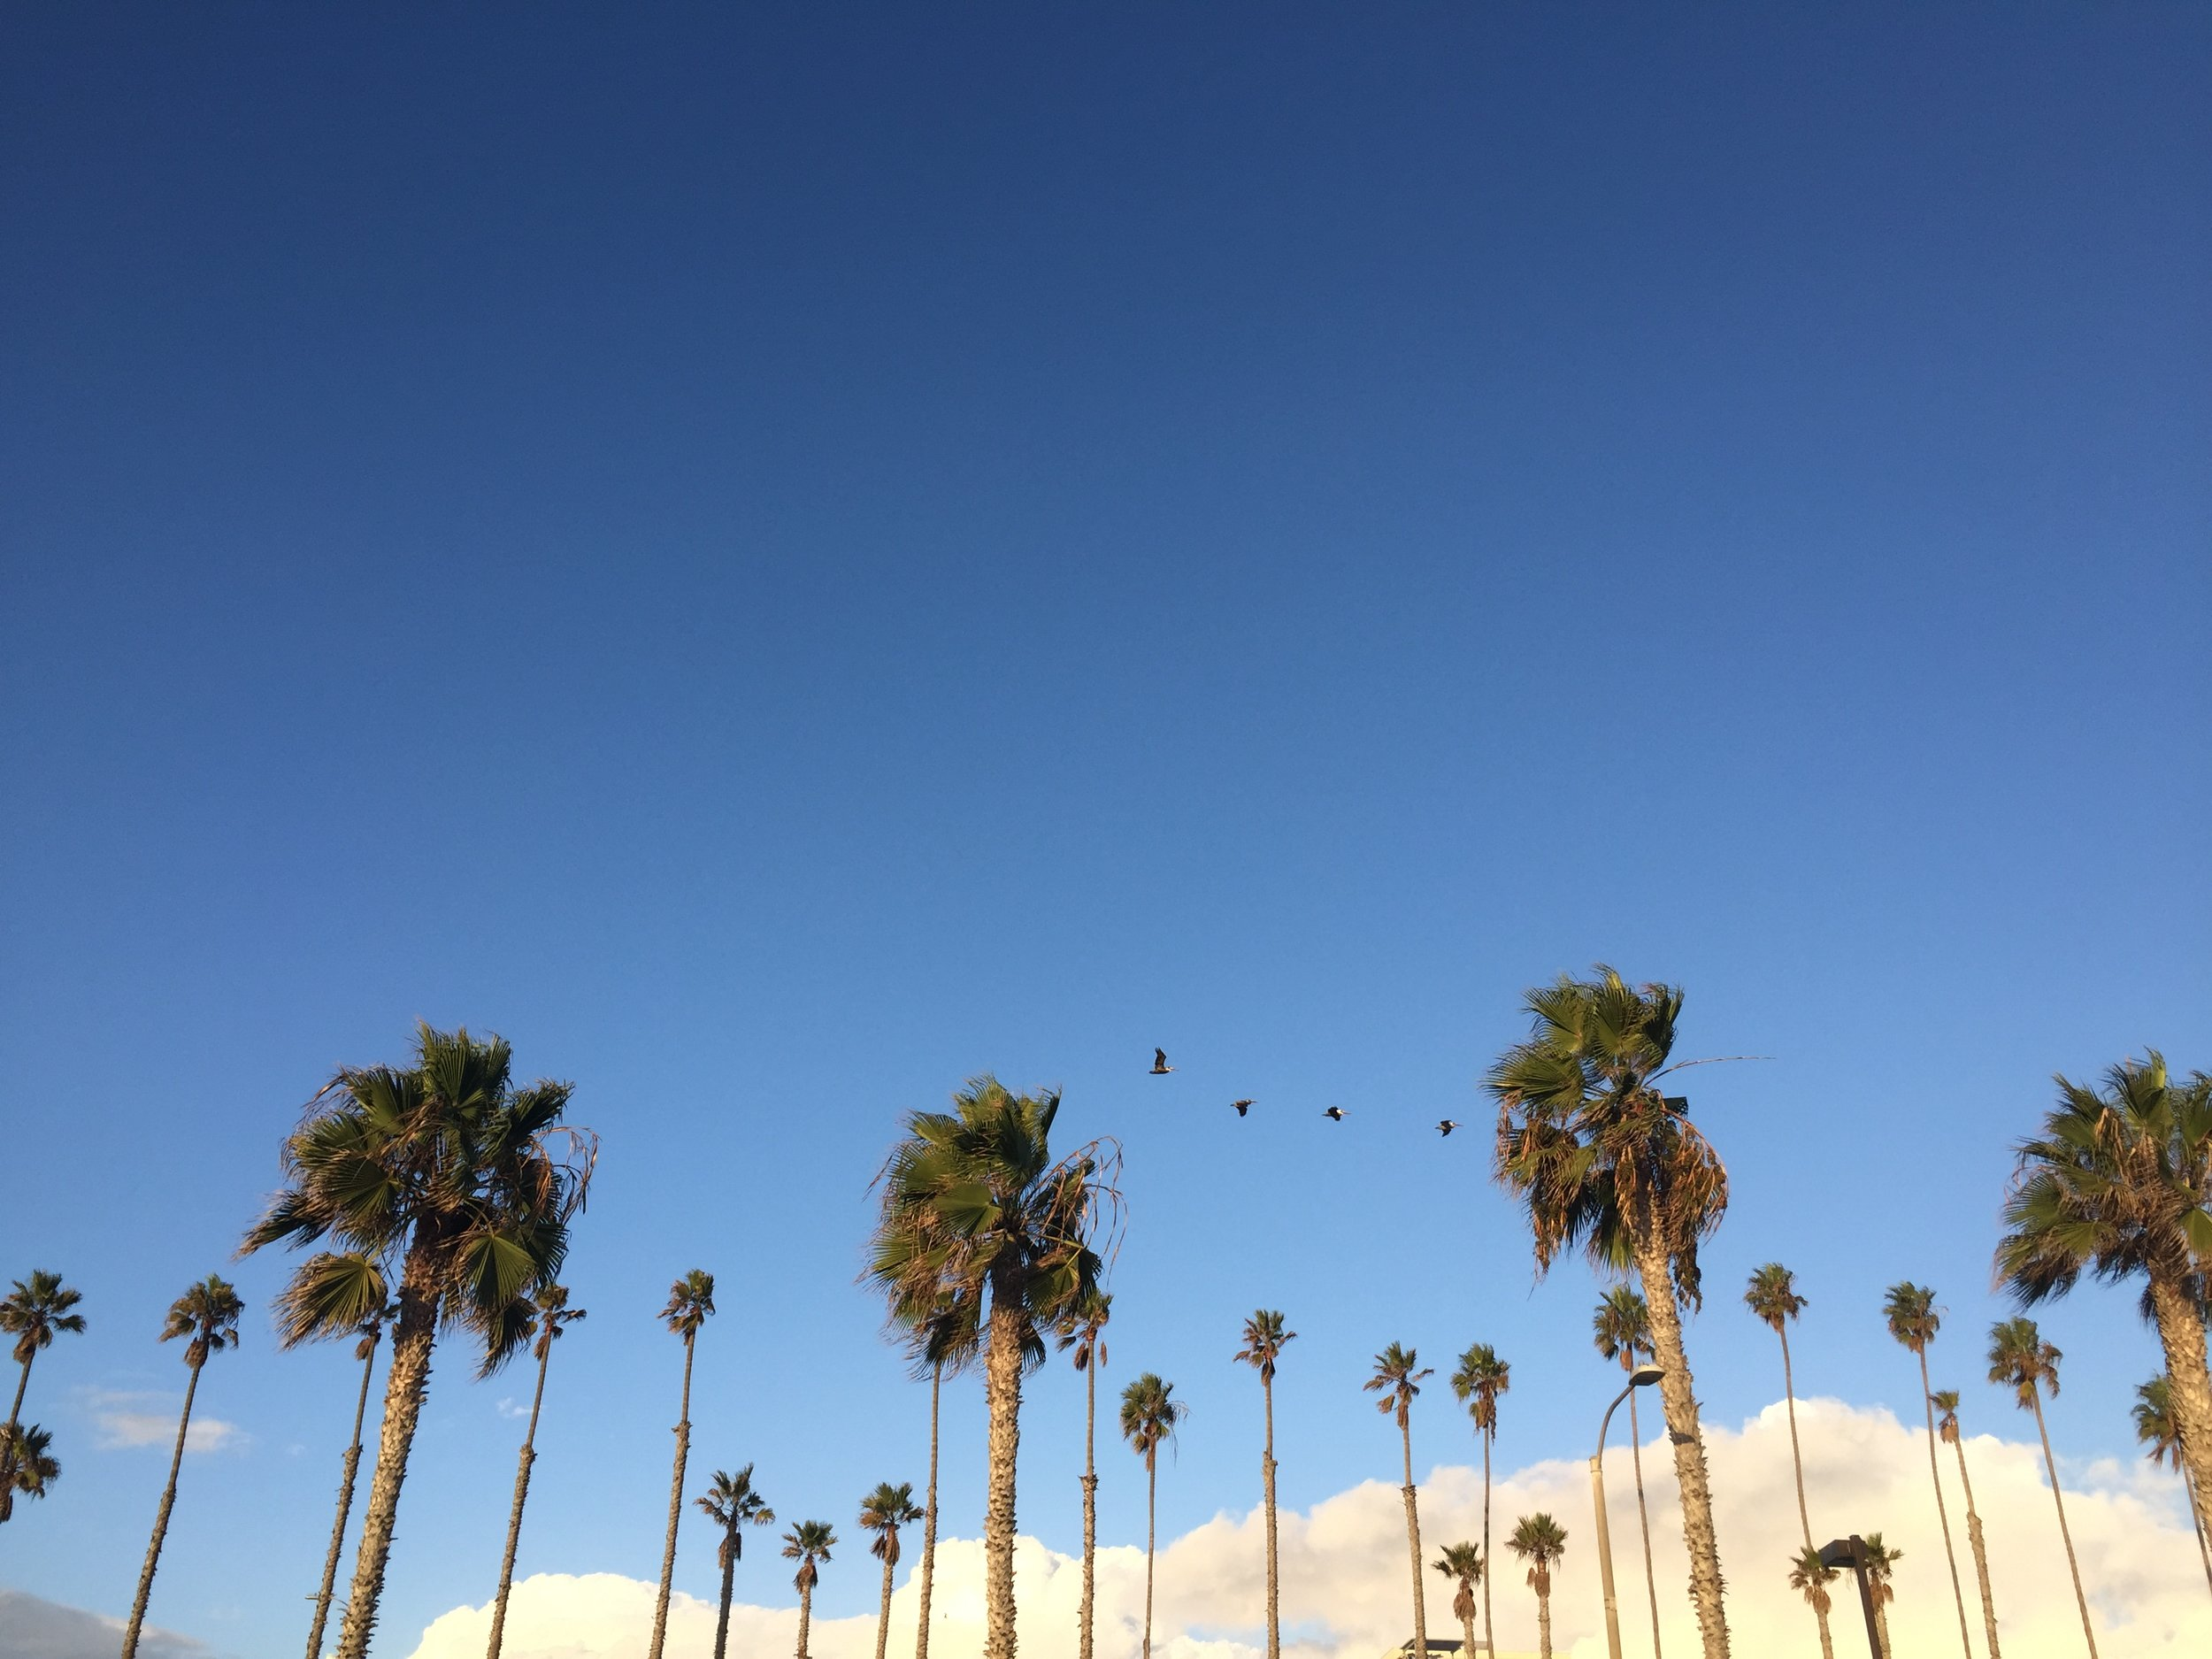 Classic California view